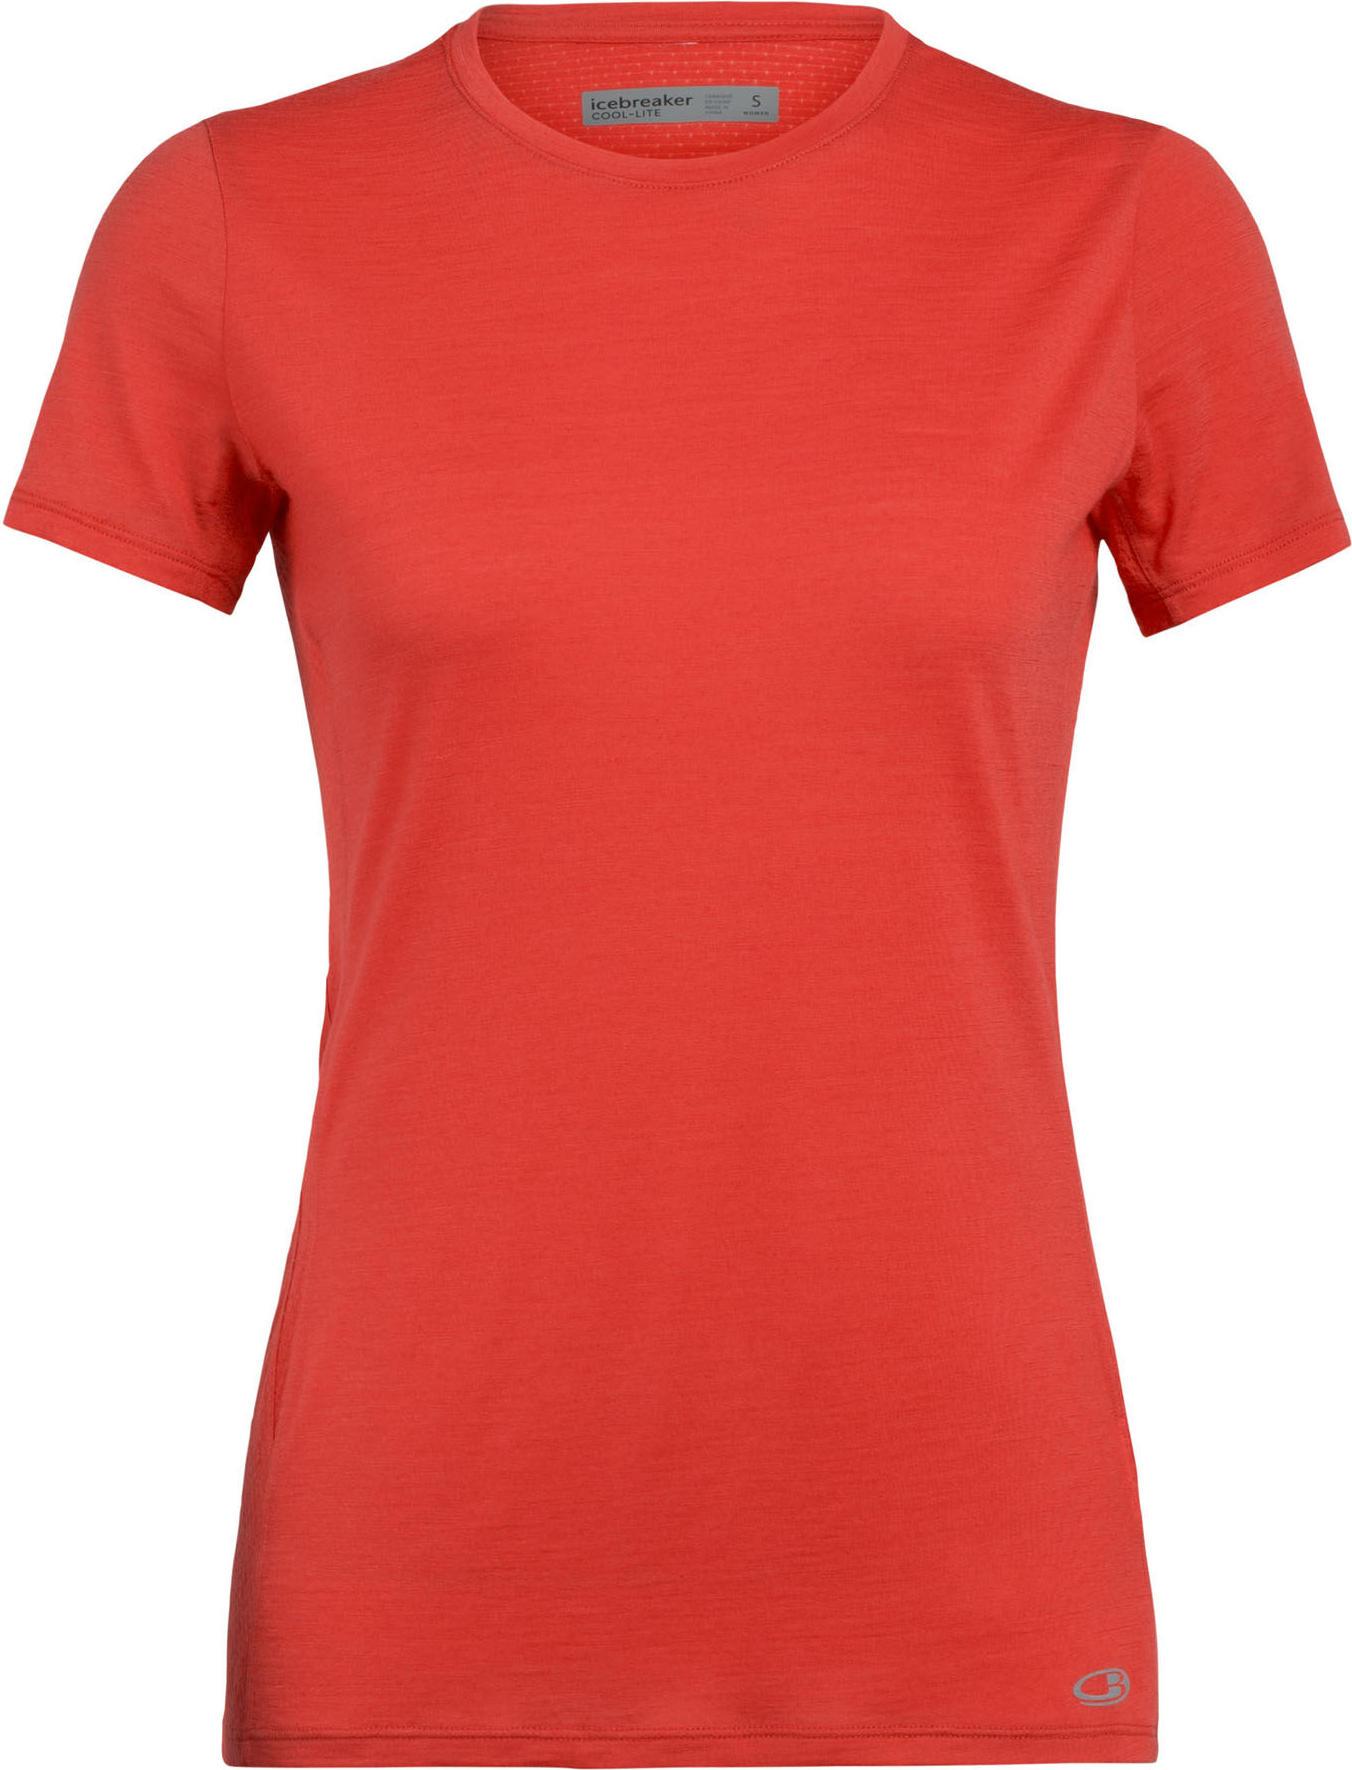 Icebreaker Merino Elements Short Sleeve Low Crew Neck Shirt Elements Short Sleeve Low Crew Neck Shirt Damen